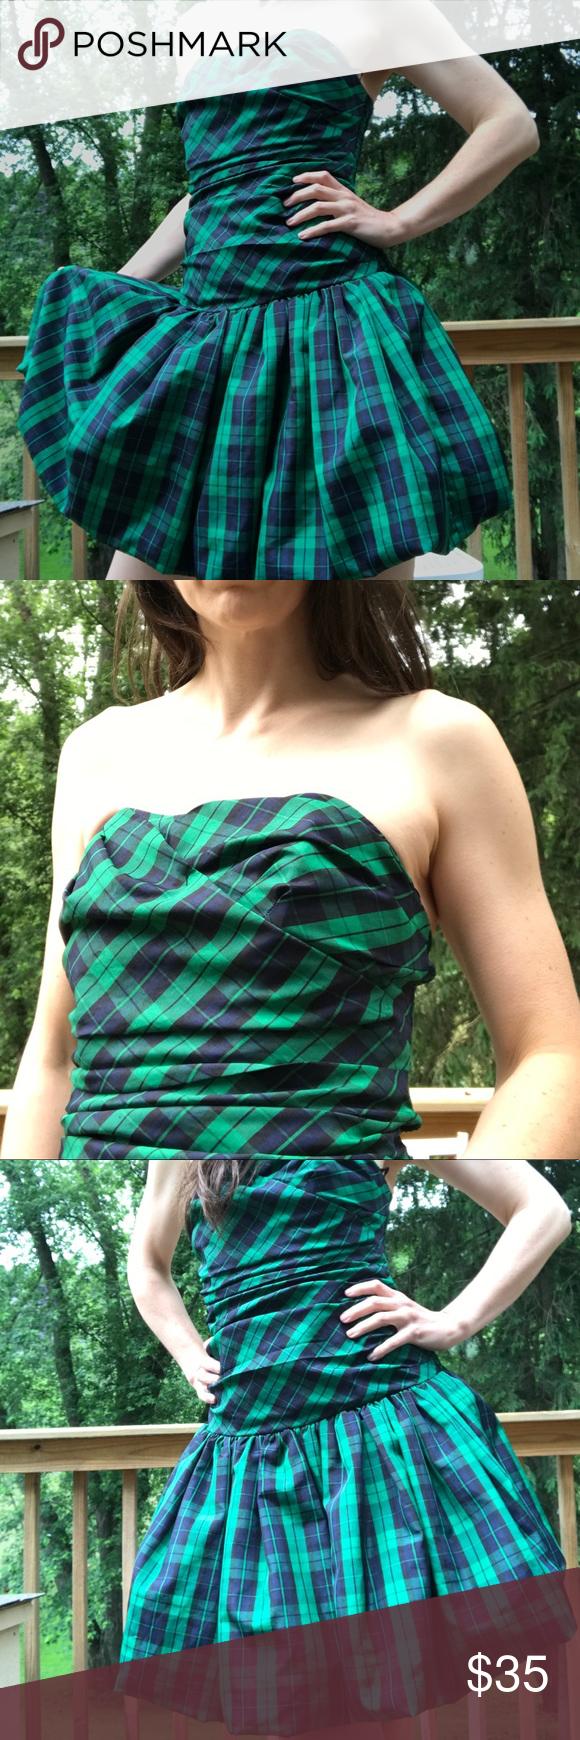 Luella For Target Green Plaid Minidress Taffeta Looks Amazing As An Alternative Prom Dress With A Crinoline And Combat Boo Target Dresses Dresses Taffeta Dress [ 1740 x 580 Pixel ]